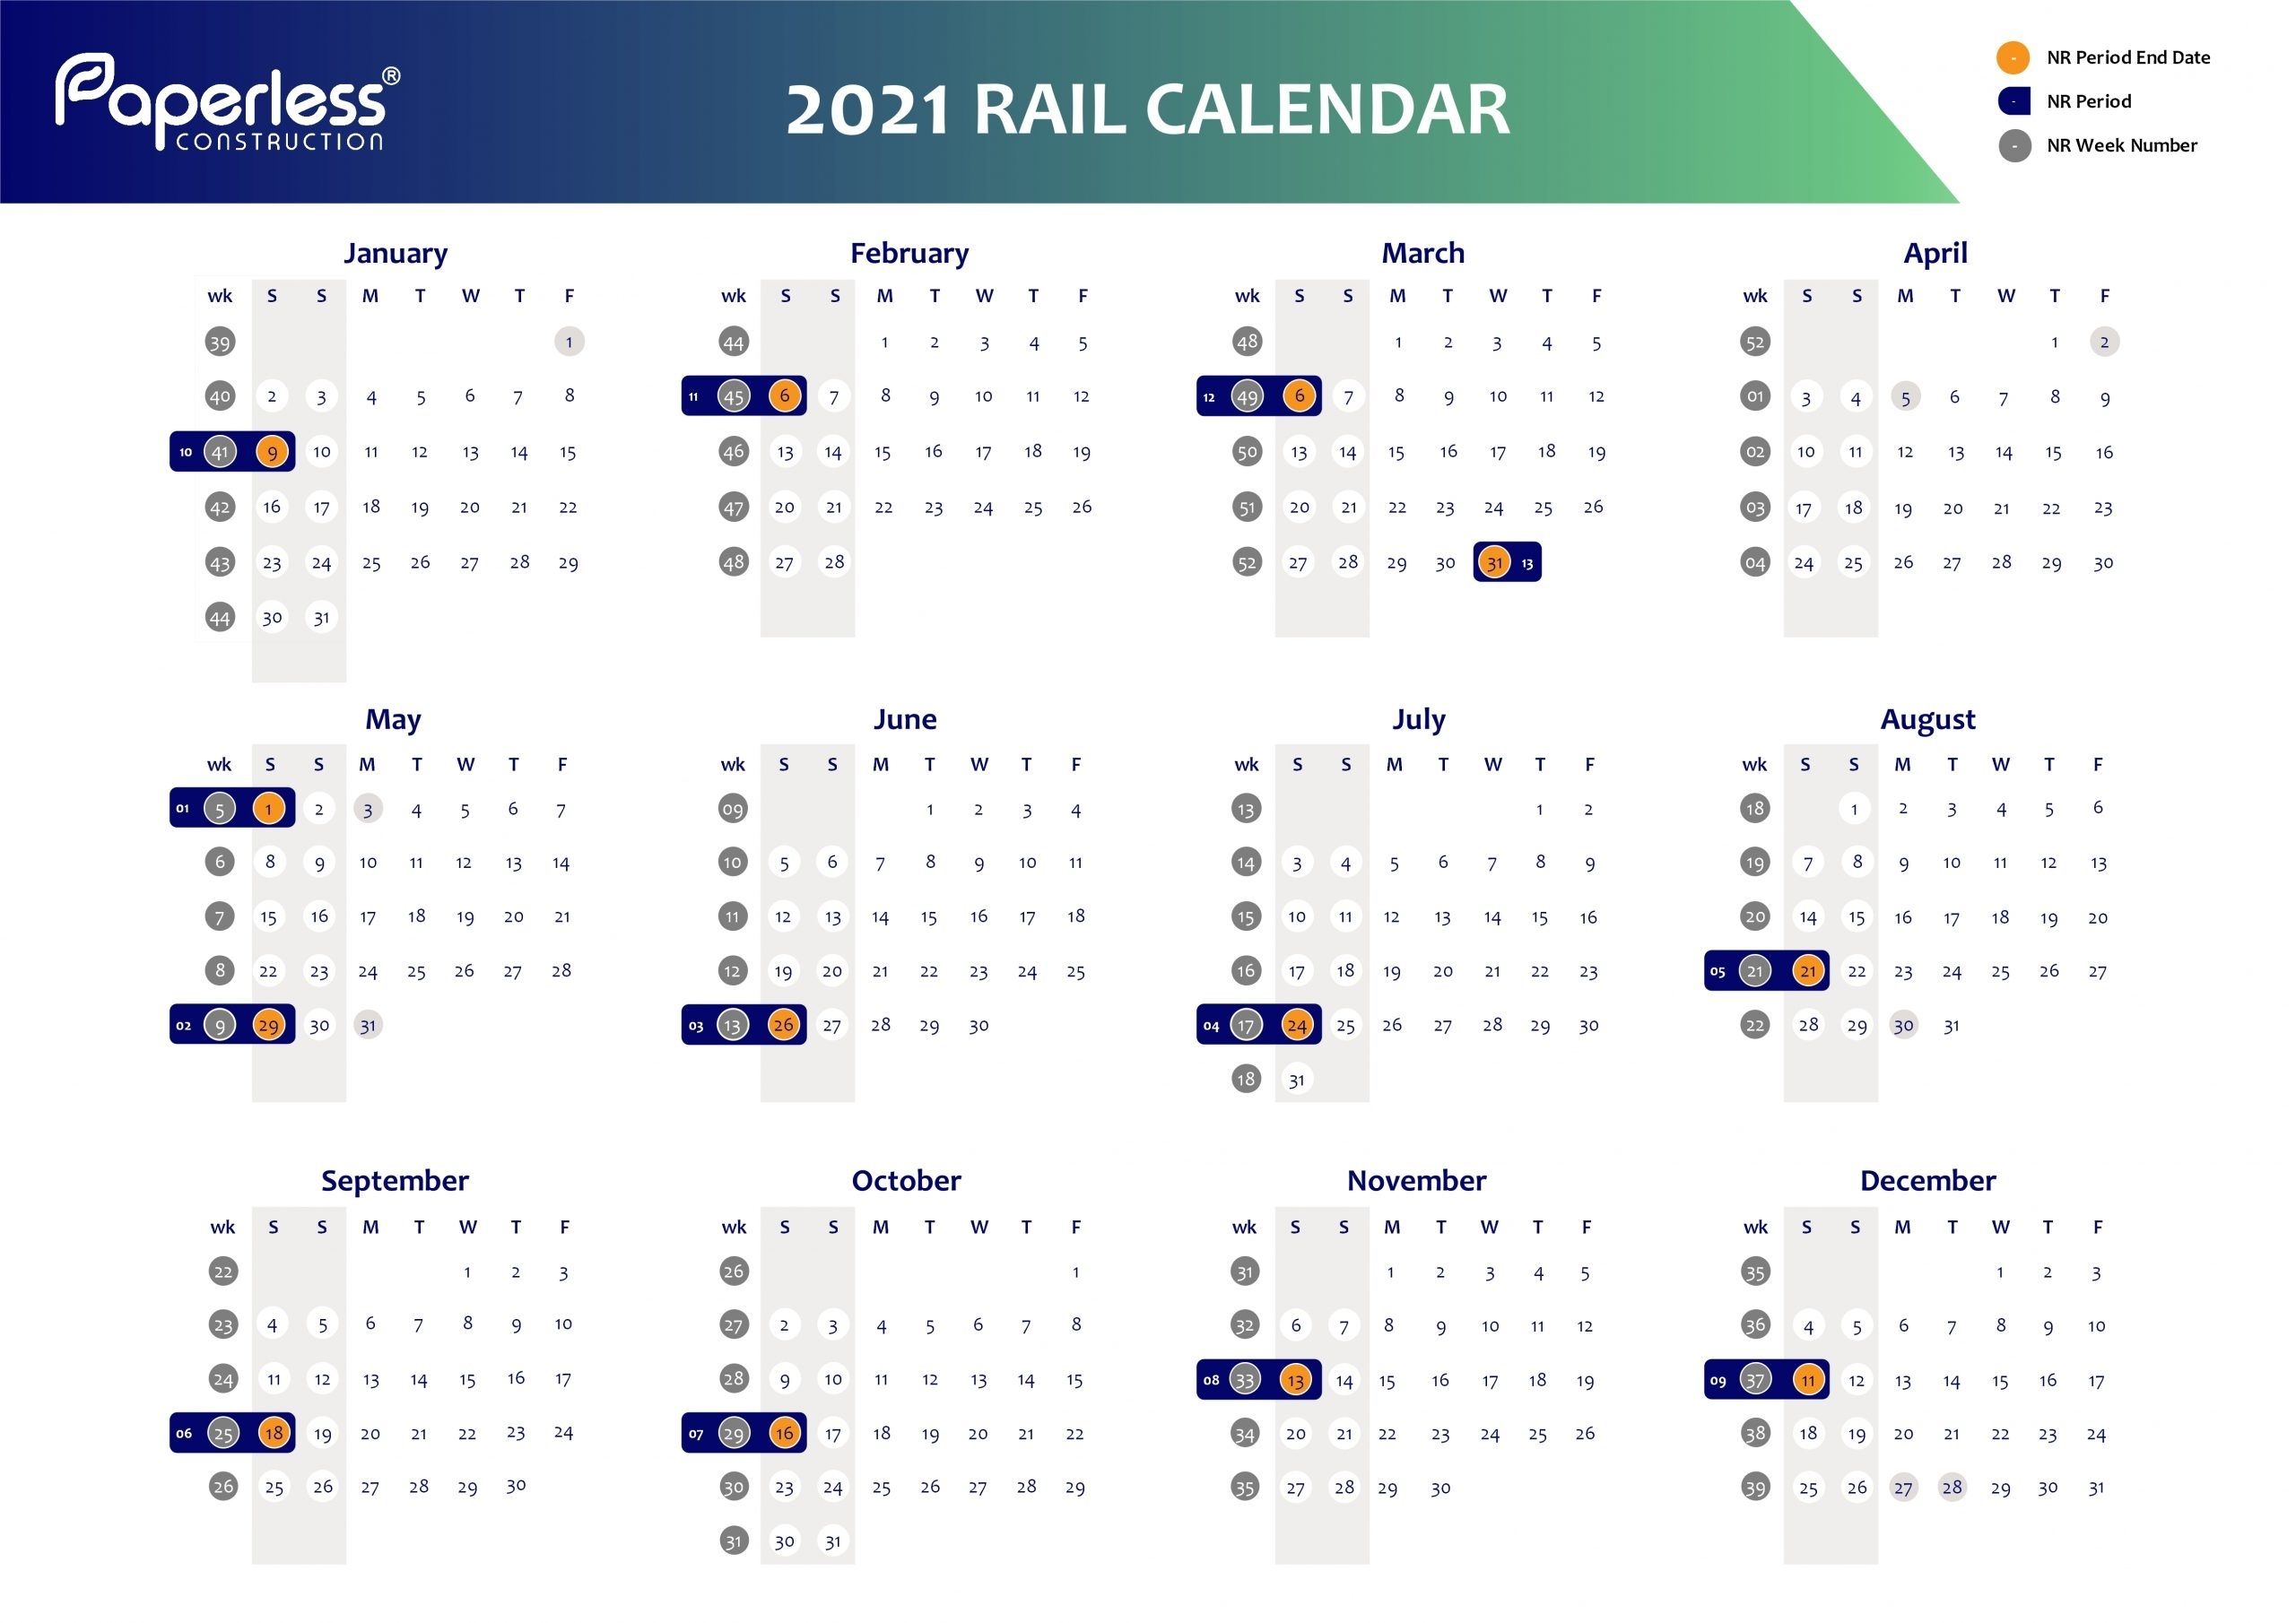 Catch Network Rail Week Numbers 2021